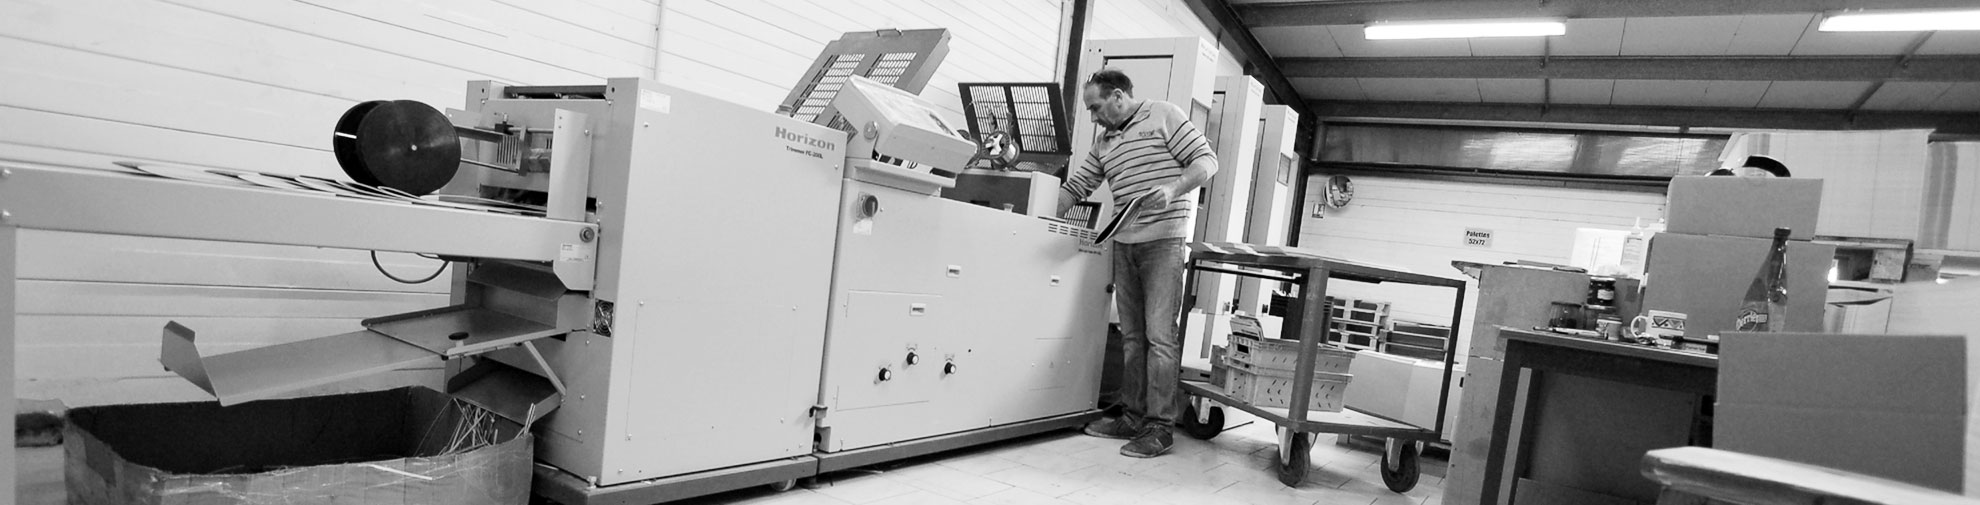 Imprimerie SODAL - Assembleuse